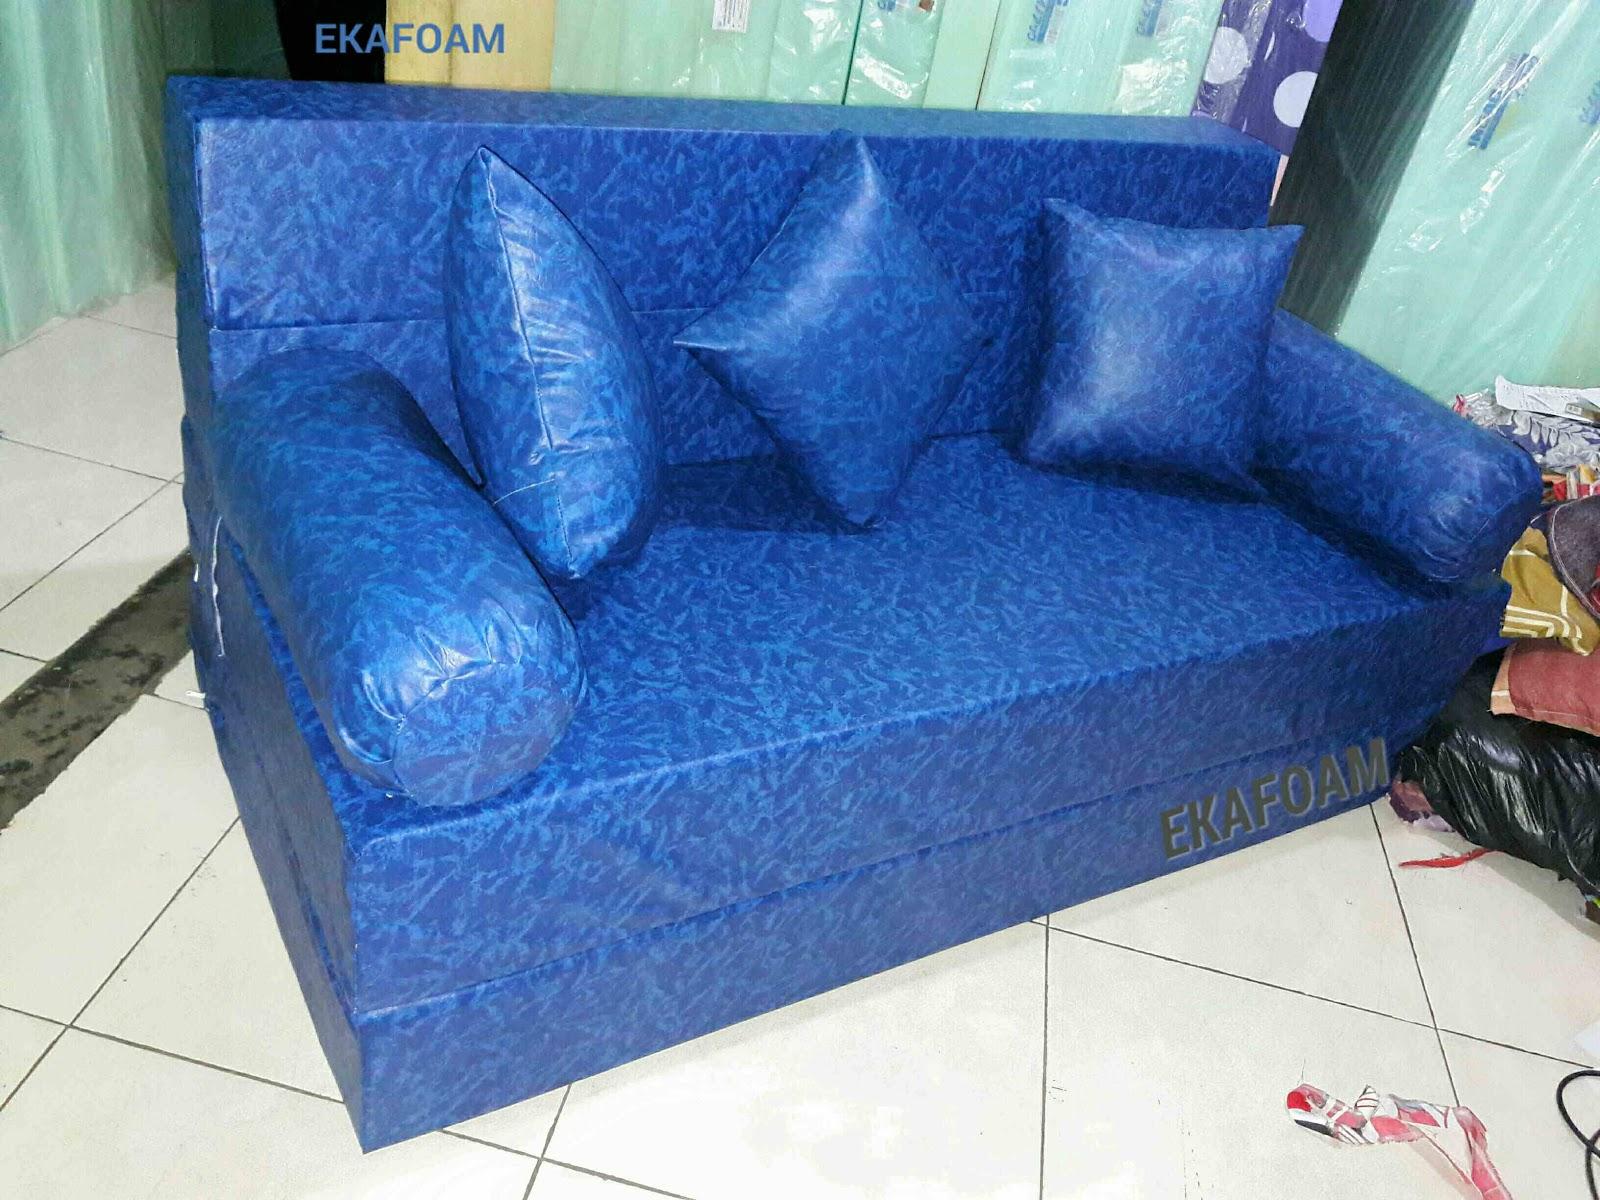 Harga Sofa Bed Inoac No 1 Ikea Microfiber Kasur Busa